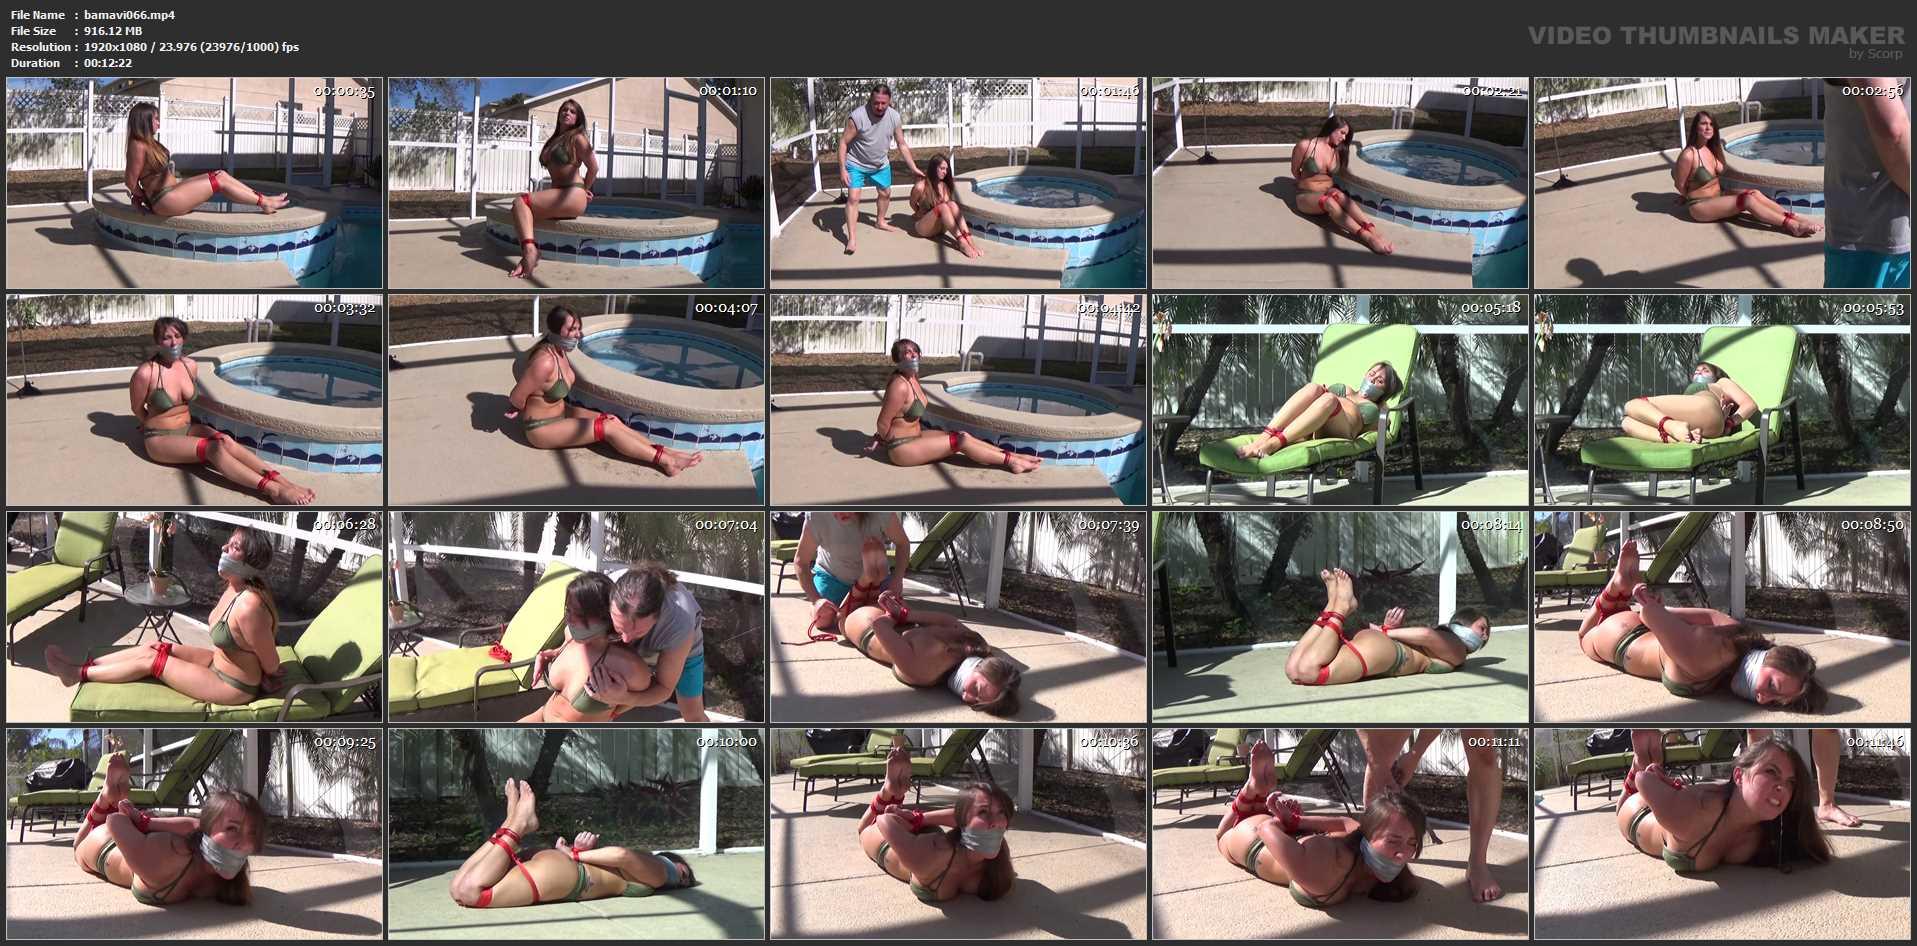 [BADMANVIDEOS] Heather Deck [FULL HD][1080p][MP4]